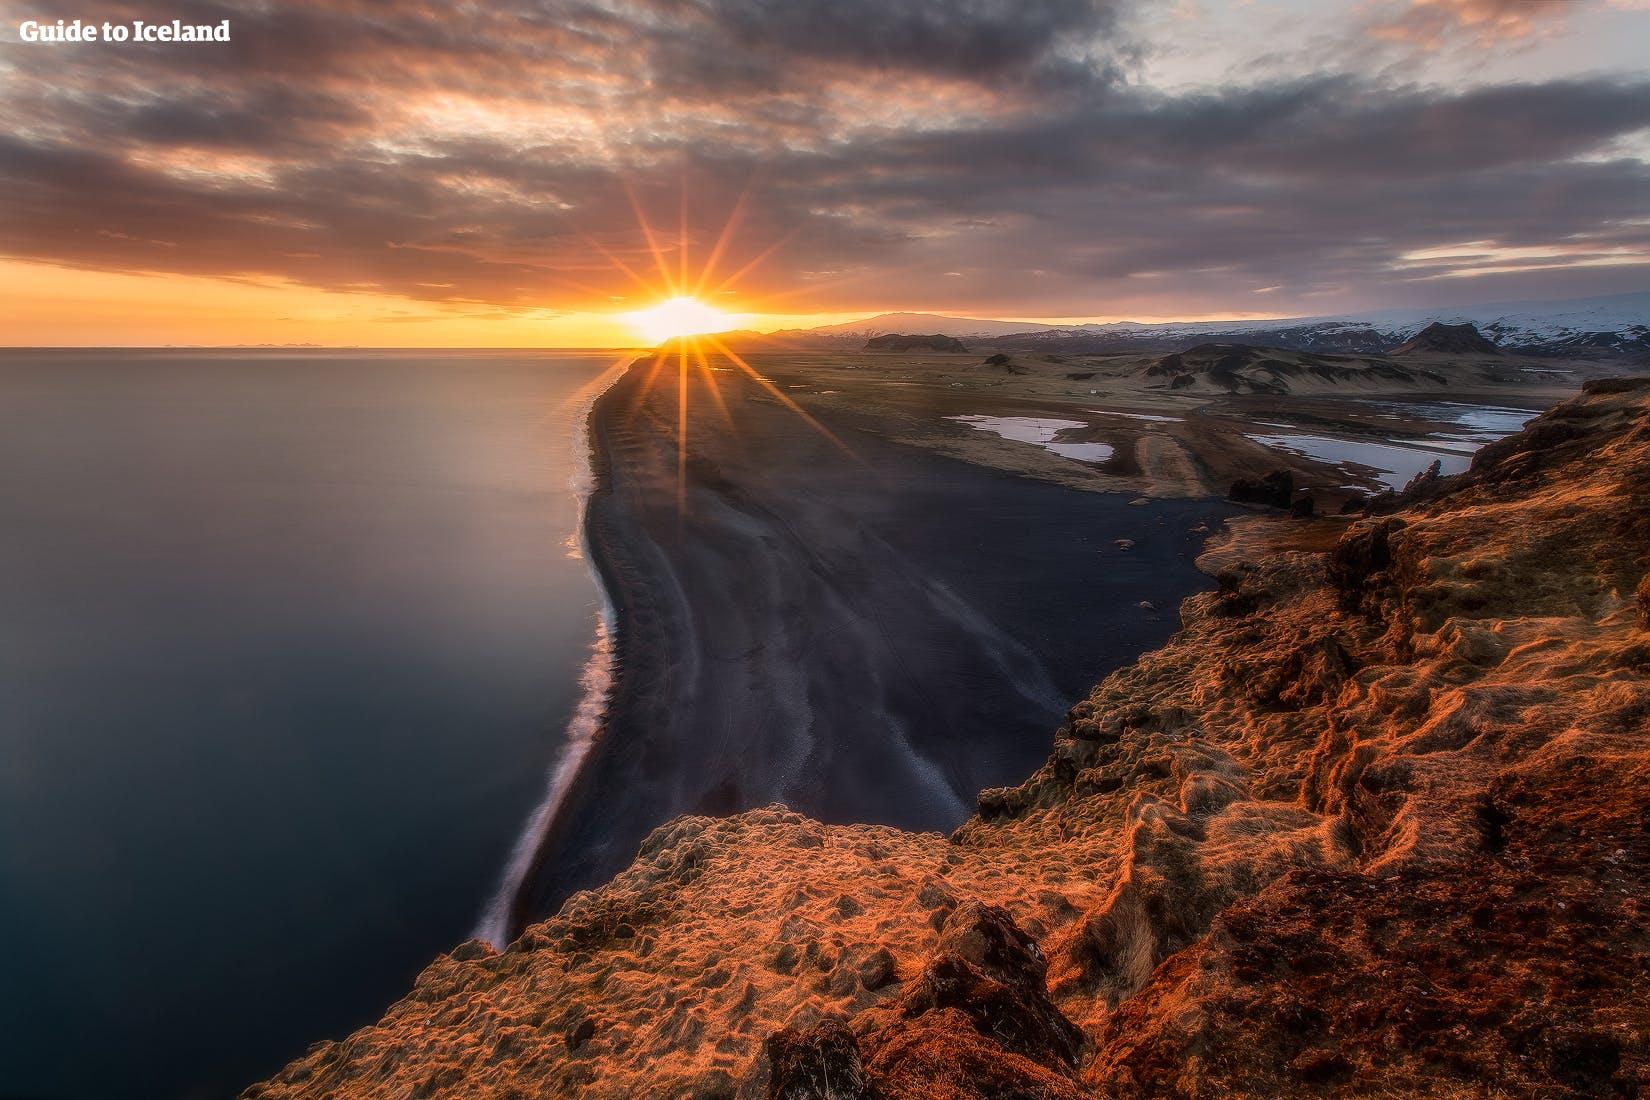 Iceland Summer Vacation | 4 Days 3 Nights